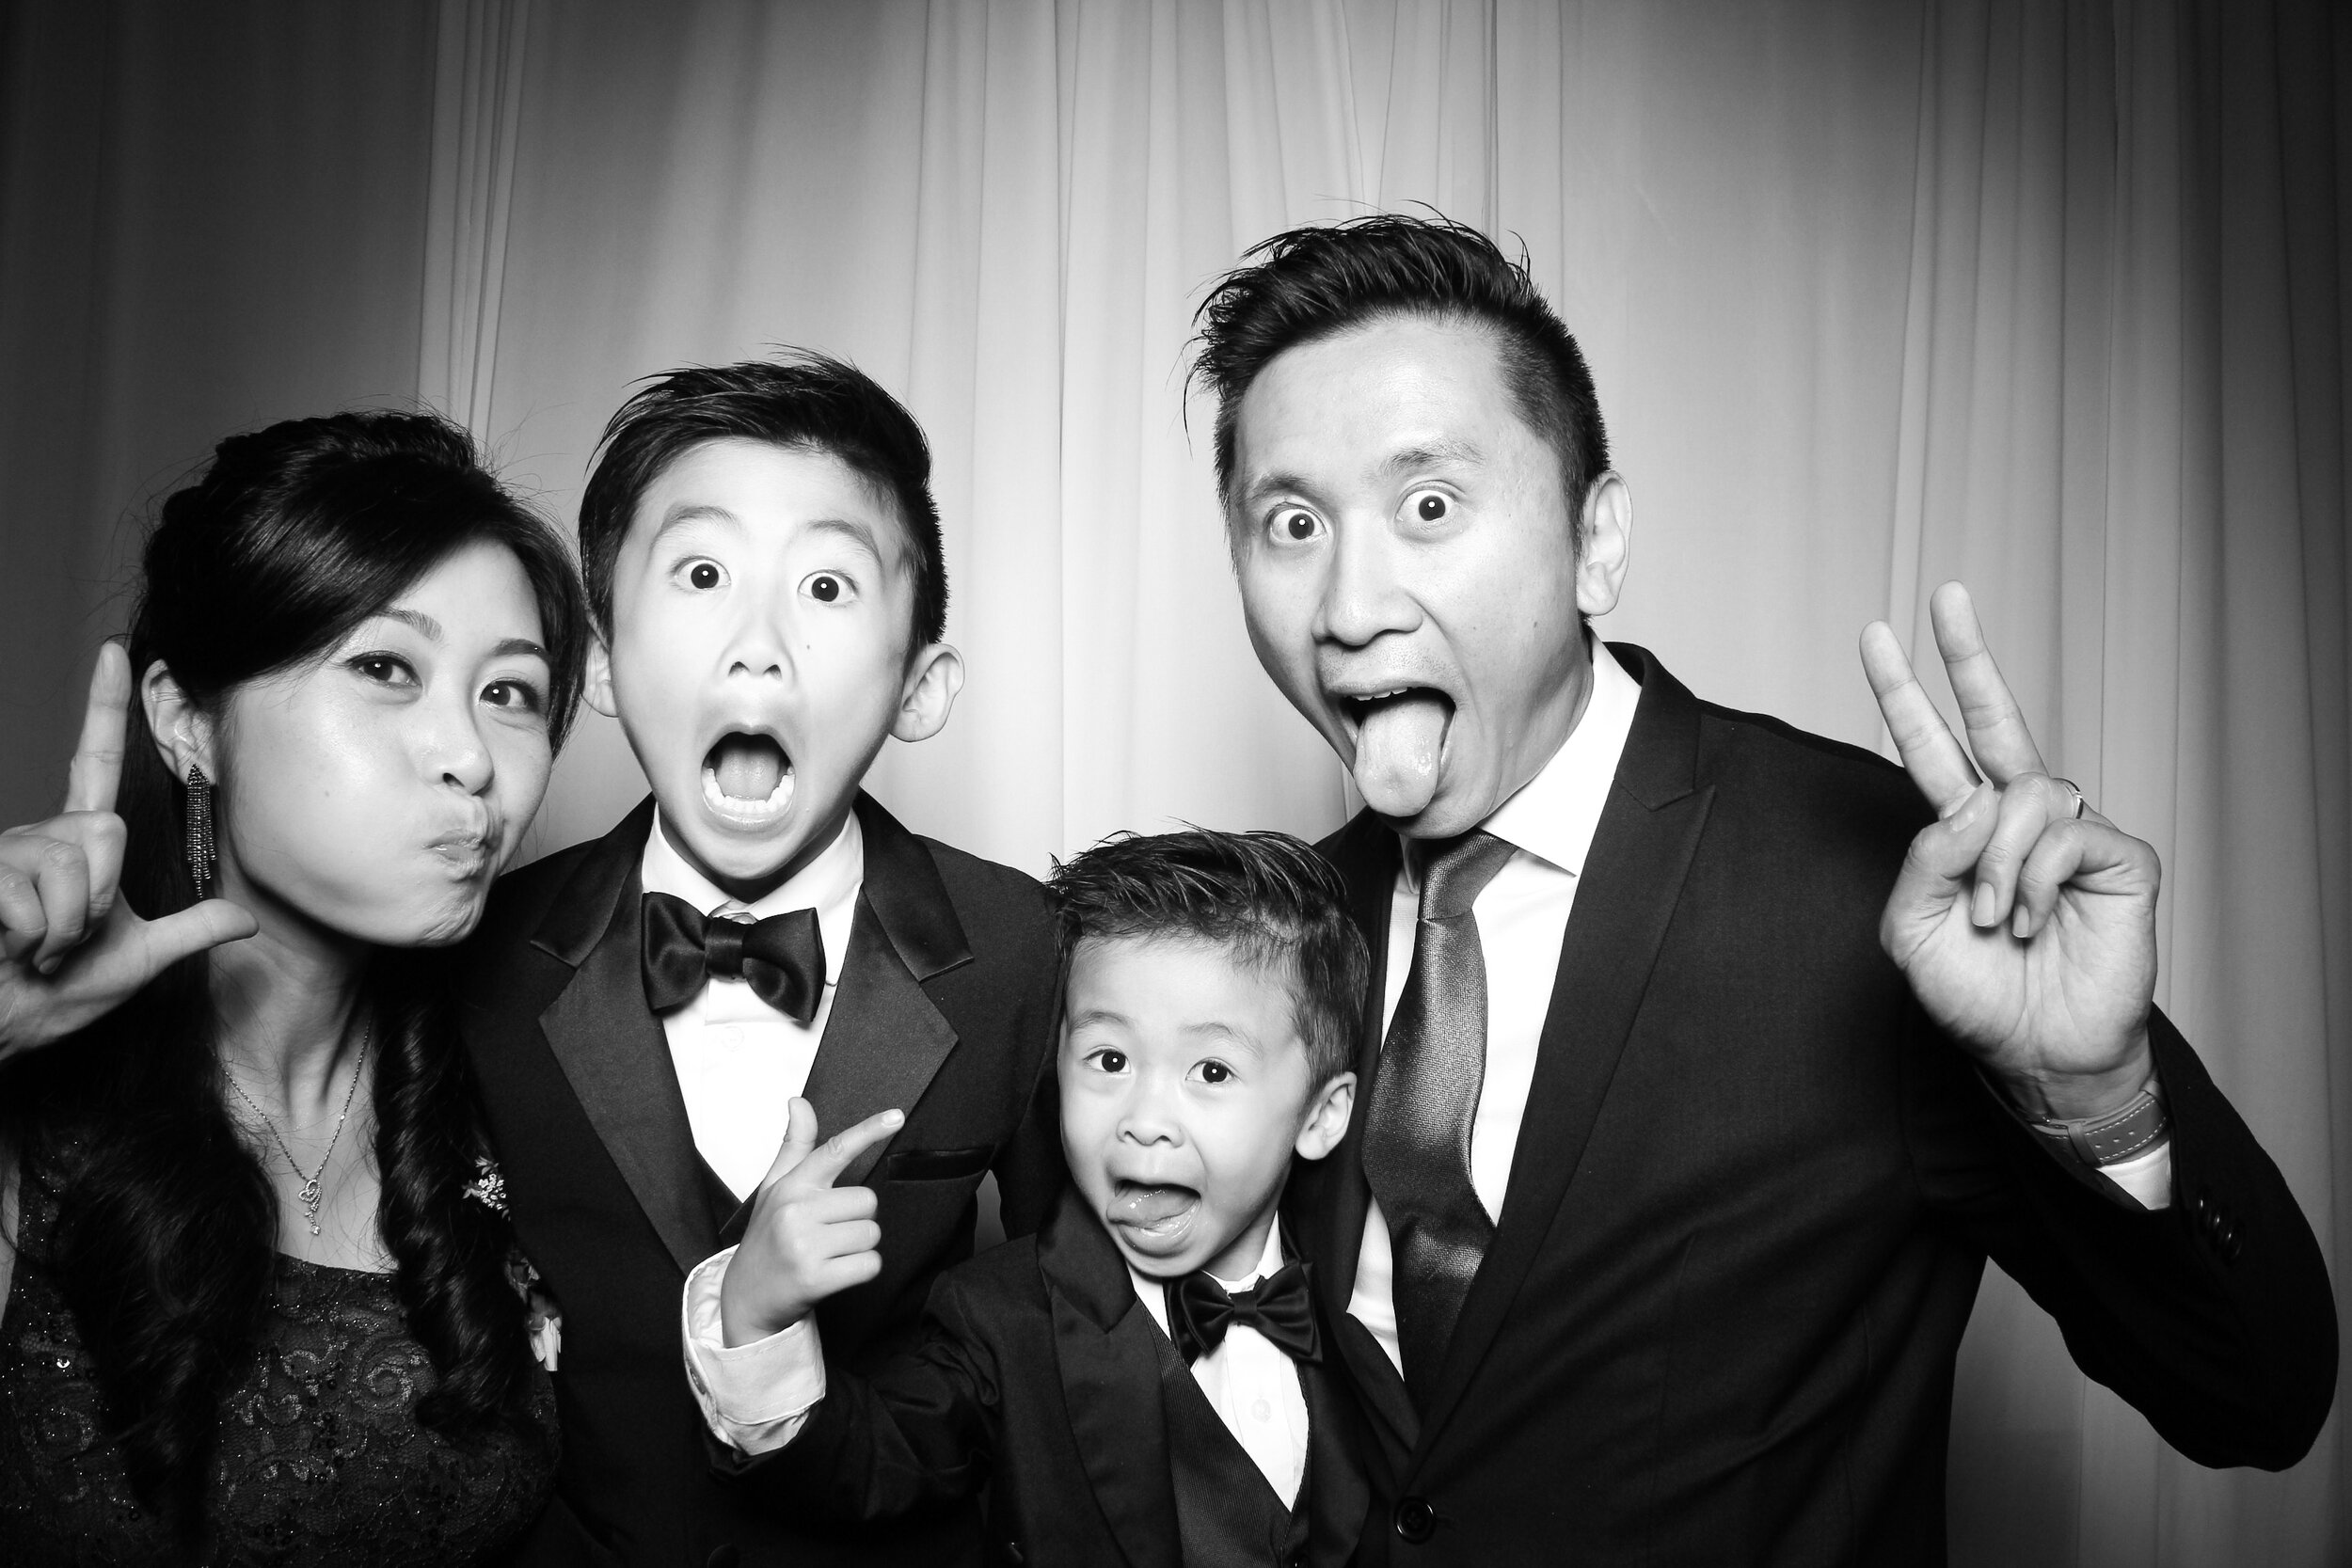 Cai_Restaurant_Chinatown_Chicago_Wedding_Photo_Booth_10.jpg